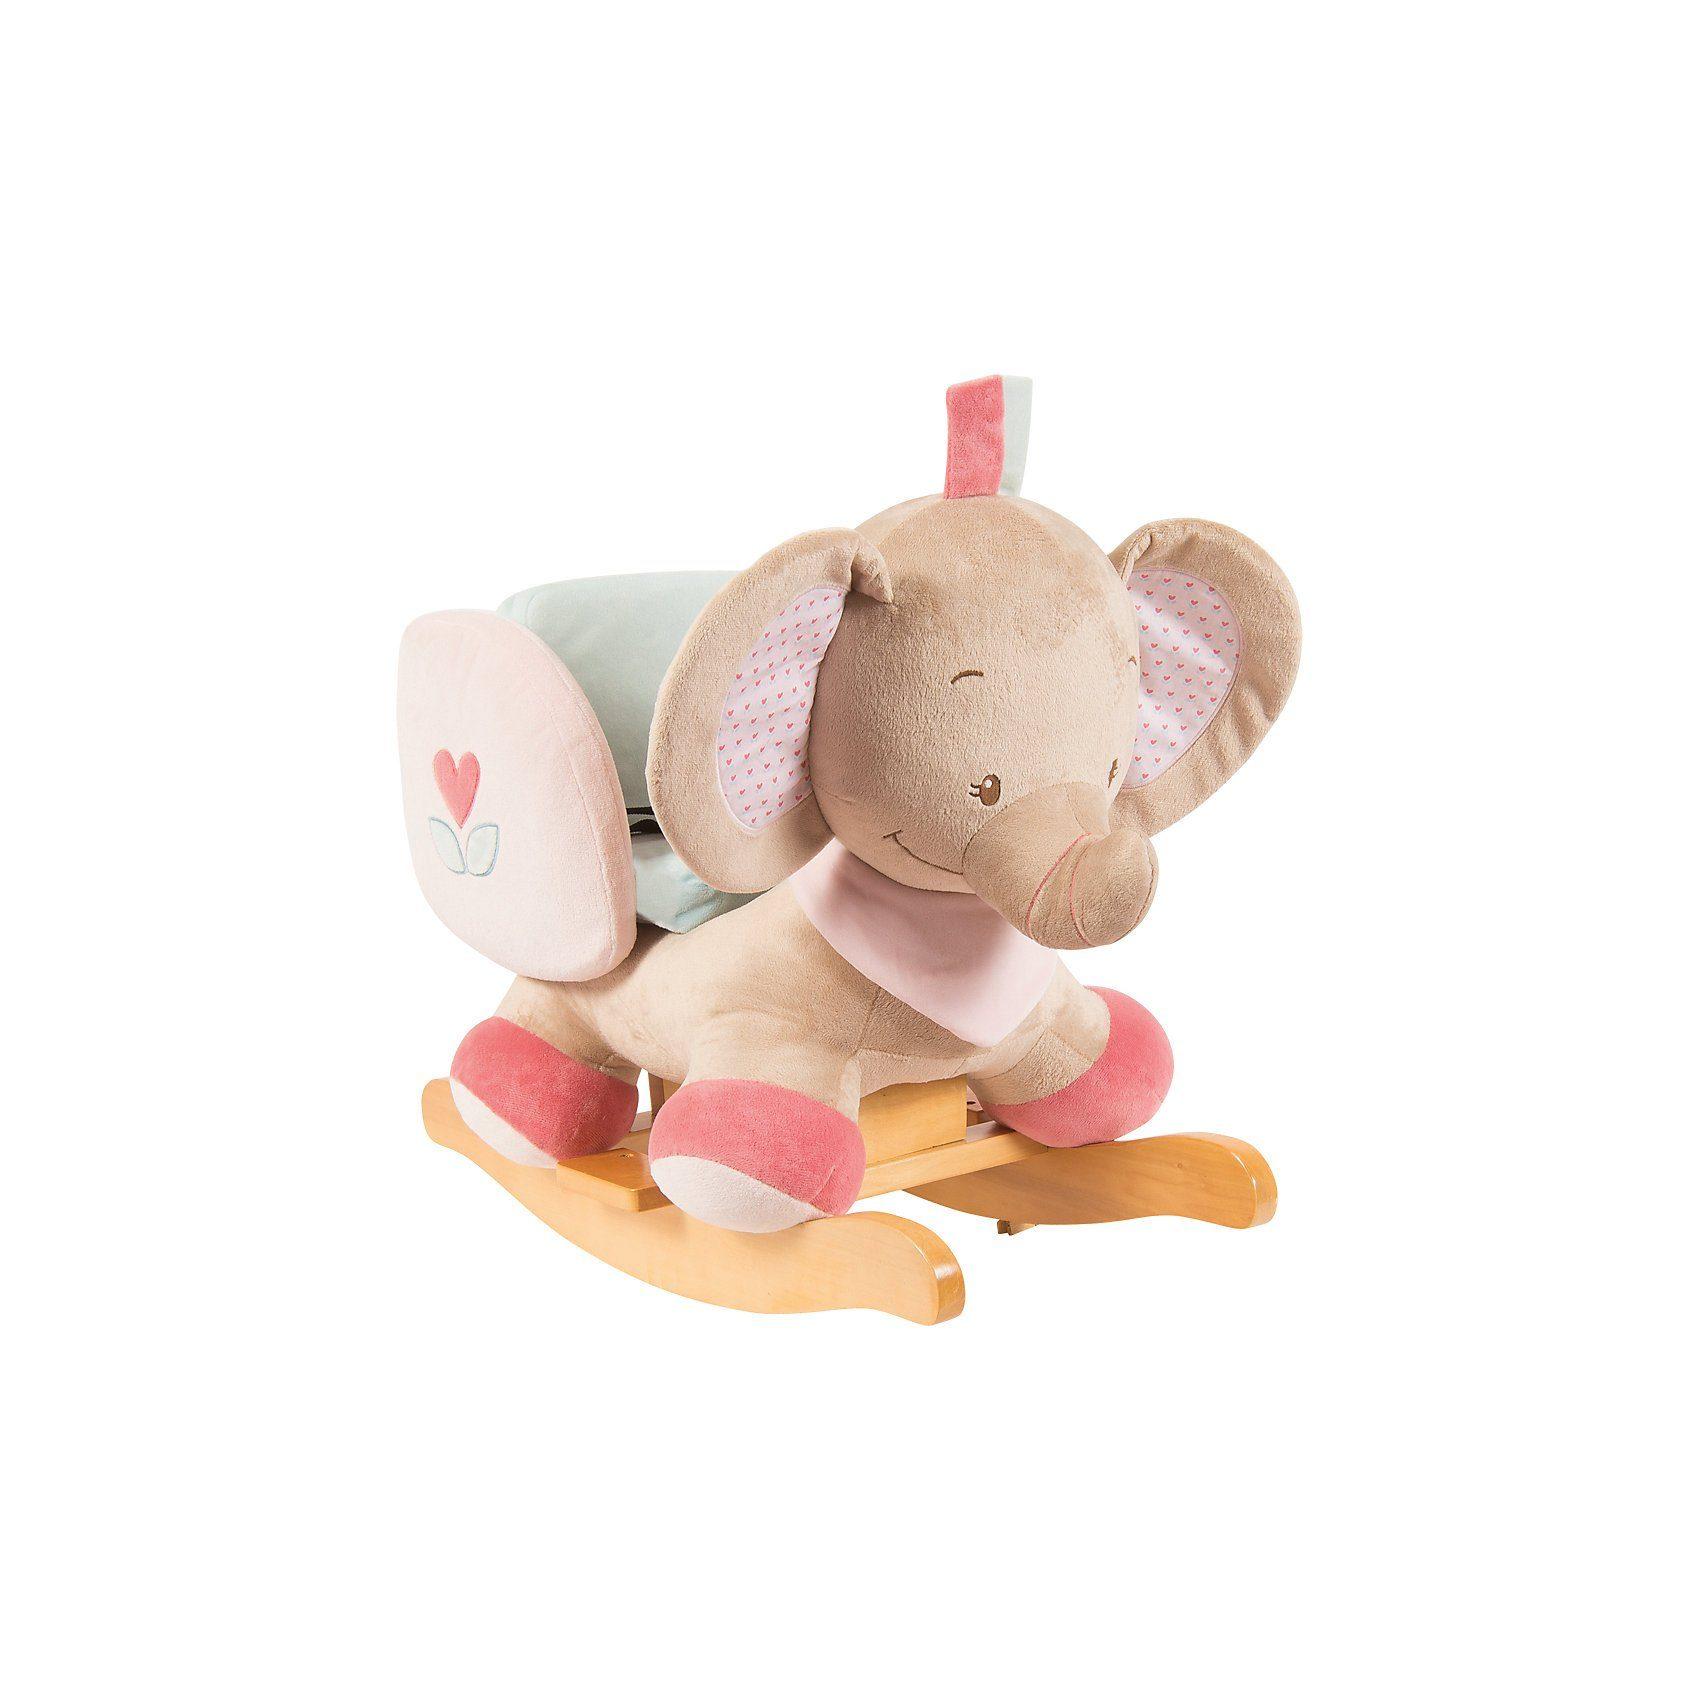 Nattou Schaukeltier Elefant Rose, Charlotte & Rose, rosa